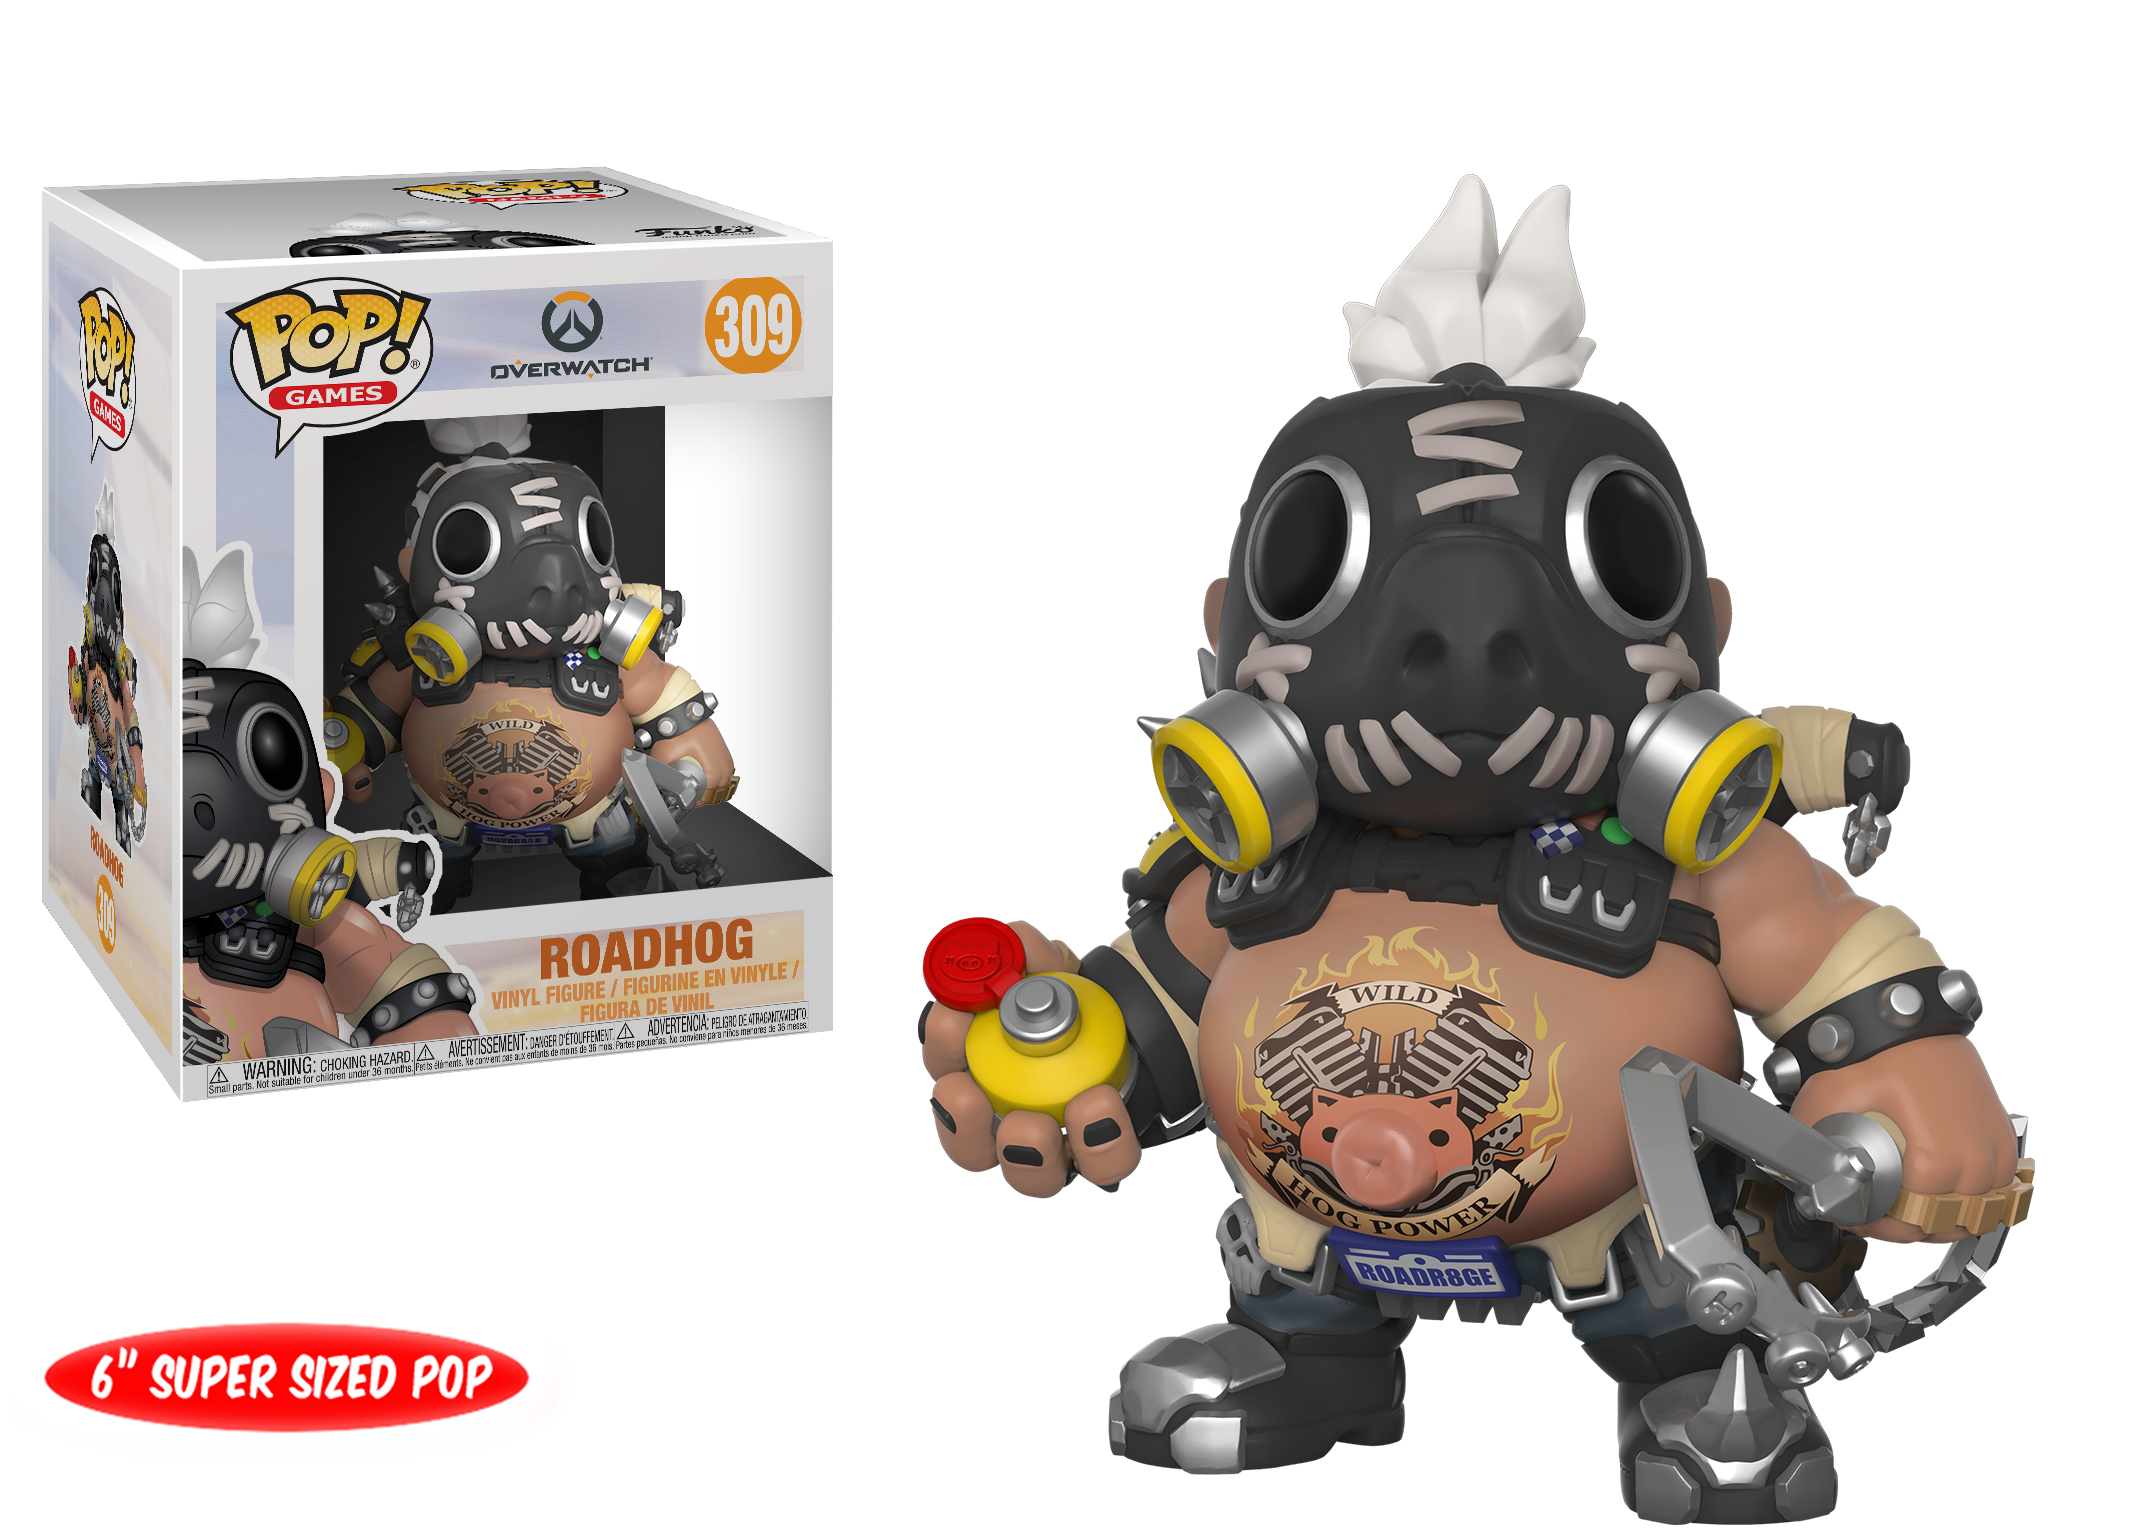 "6db82230fc2 Amazon.com  Funko Pop Games  Overwatch-6"" Road Hog 6"" Roadhog ..."